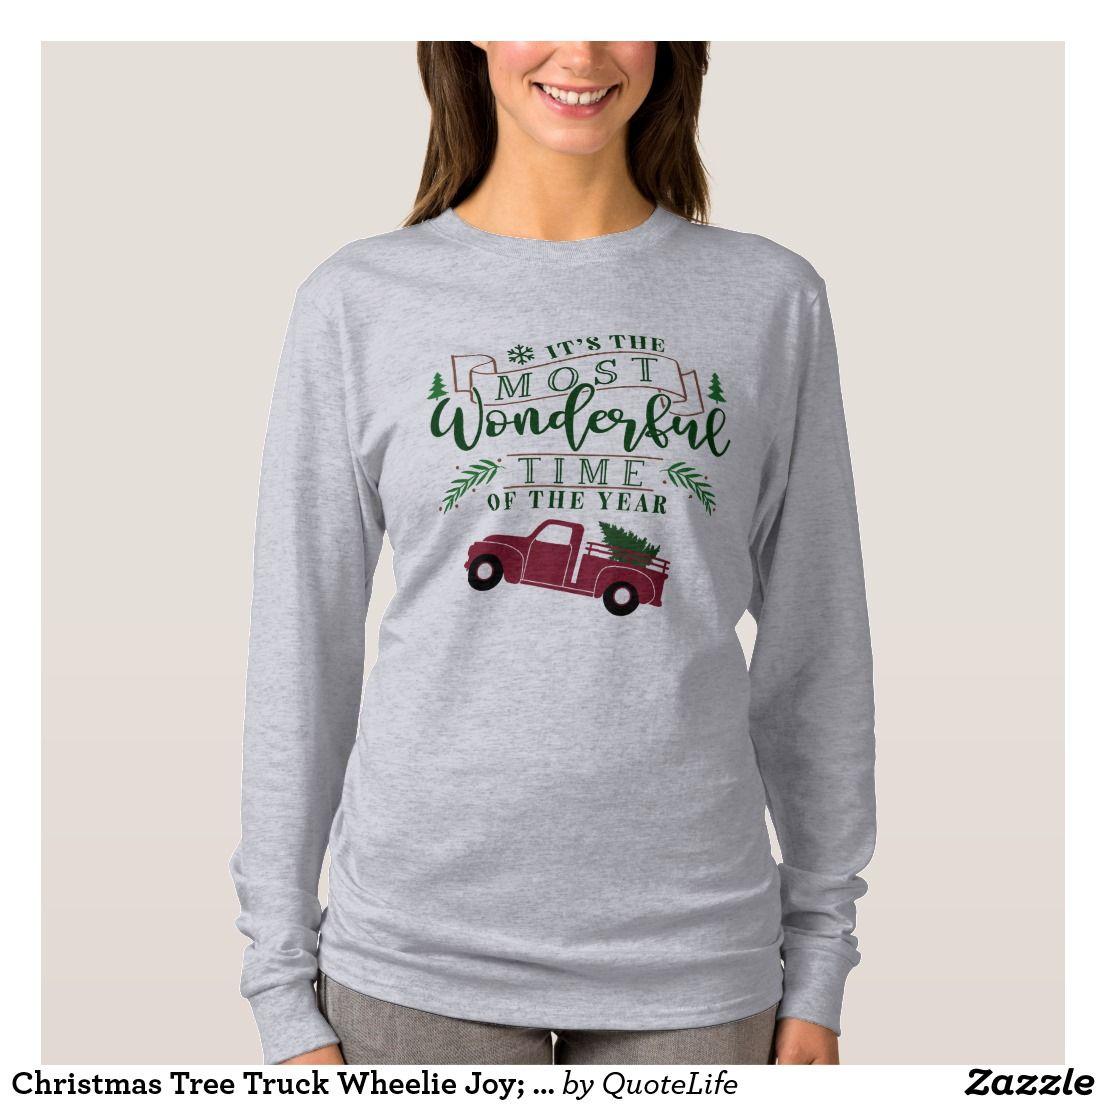 Christmas Tree Truck Wheelie Joy; Wonderful Time T-Shirt #christmas #christmasshirts #vintagechristmas #joy #mostwonderfultimeoftheyear